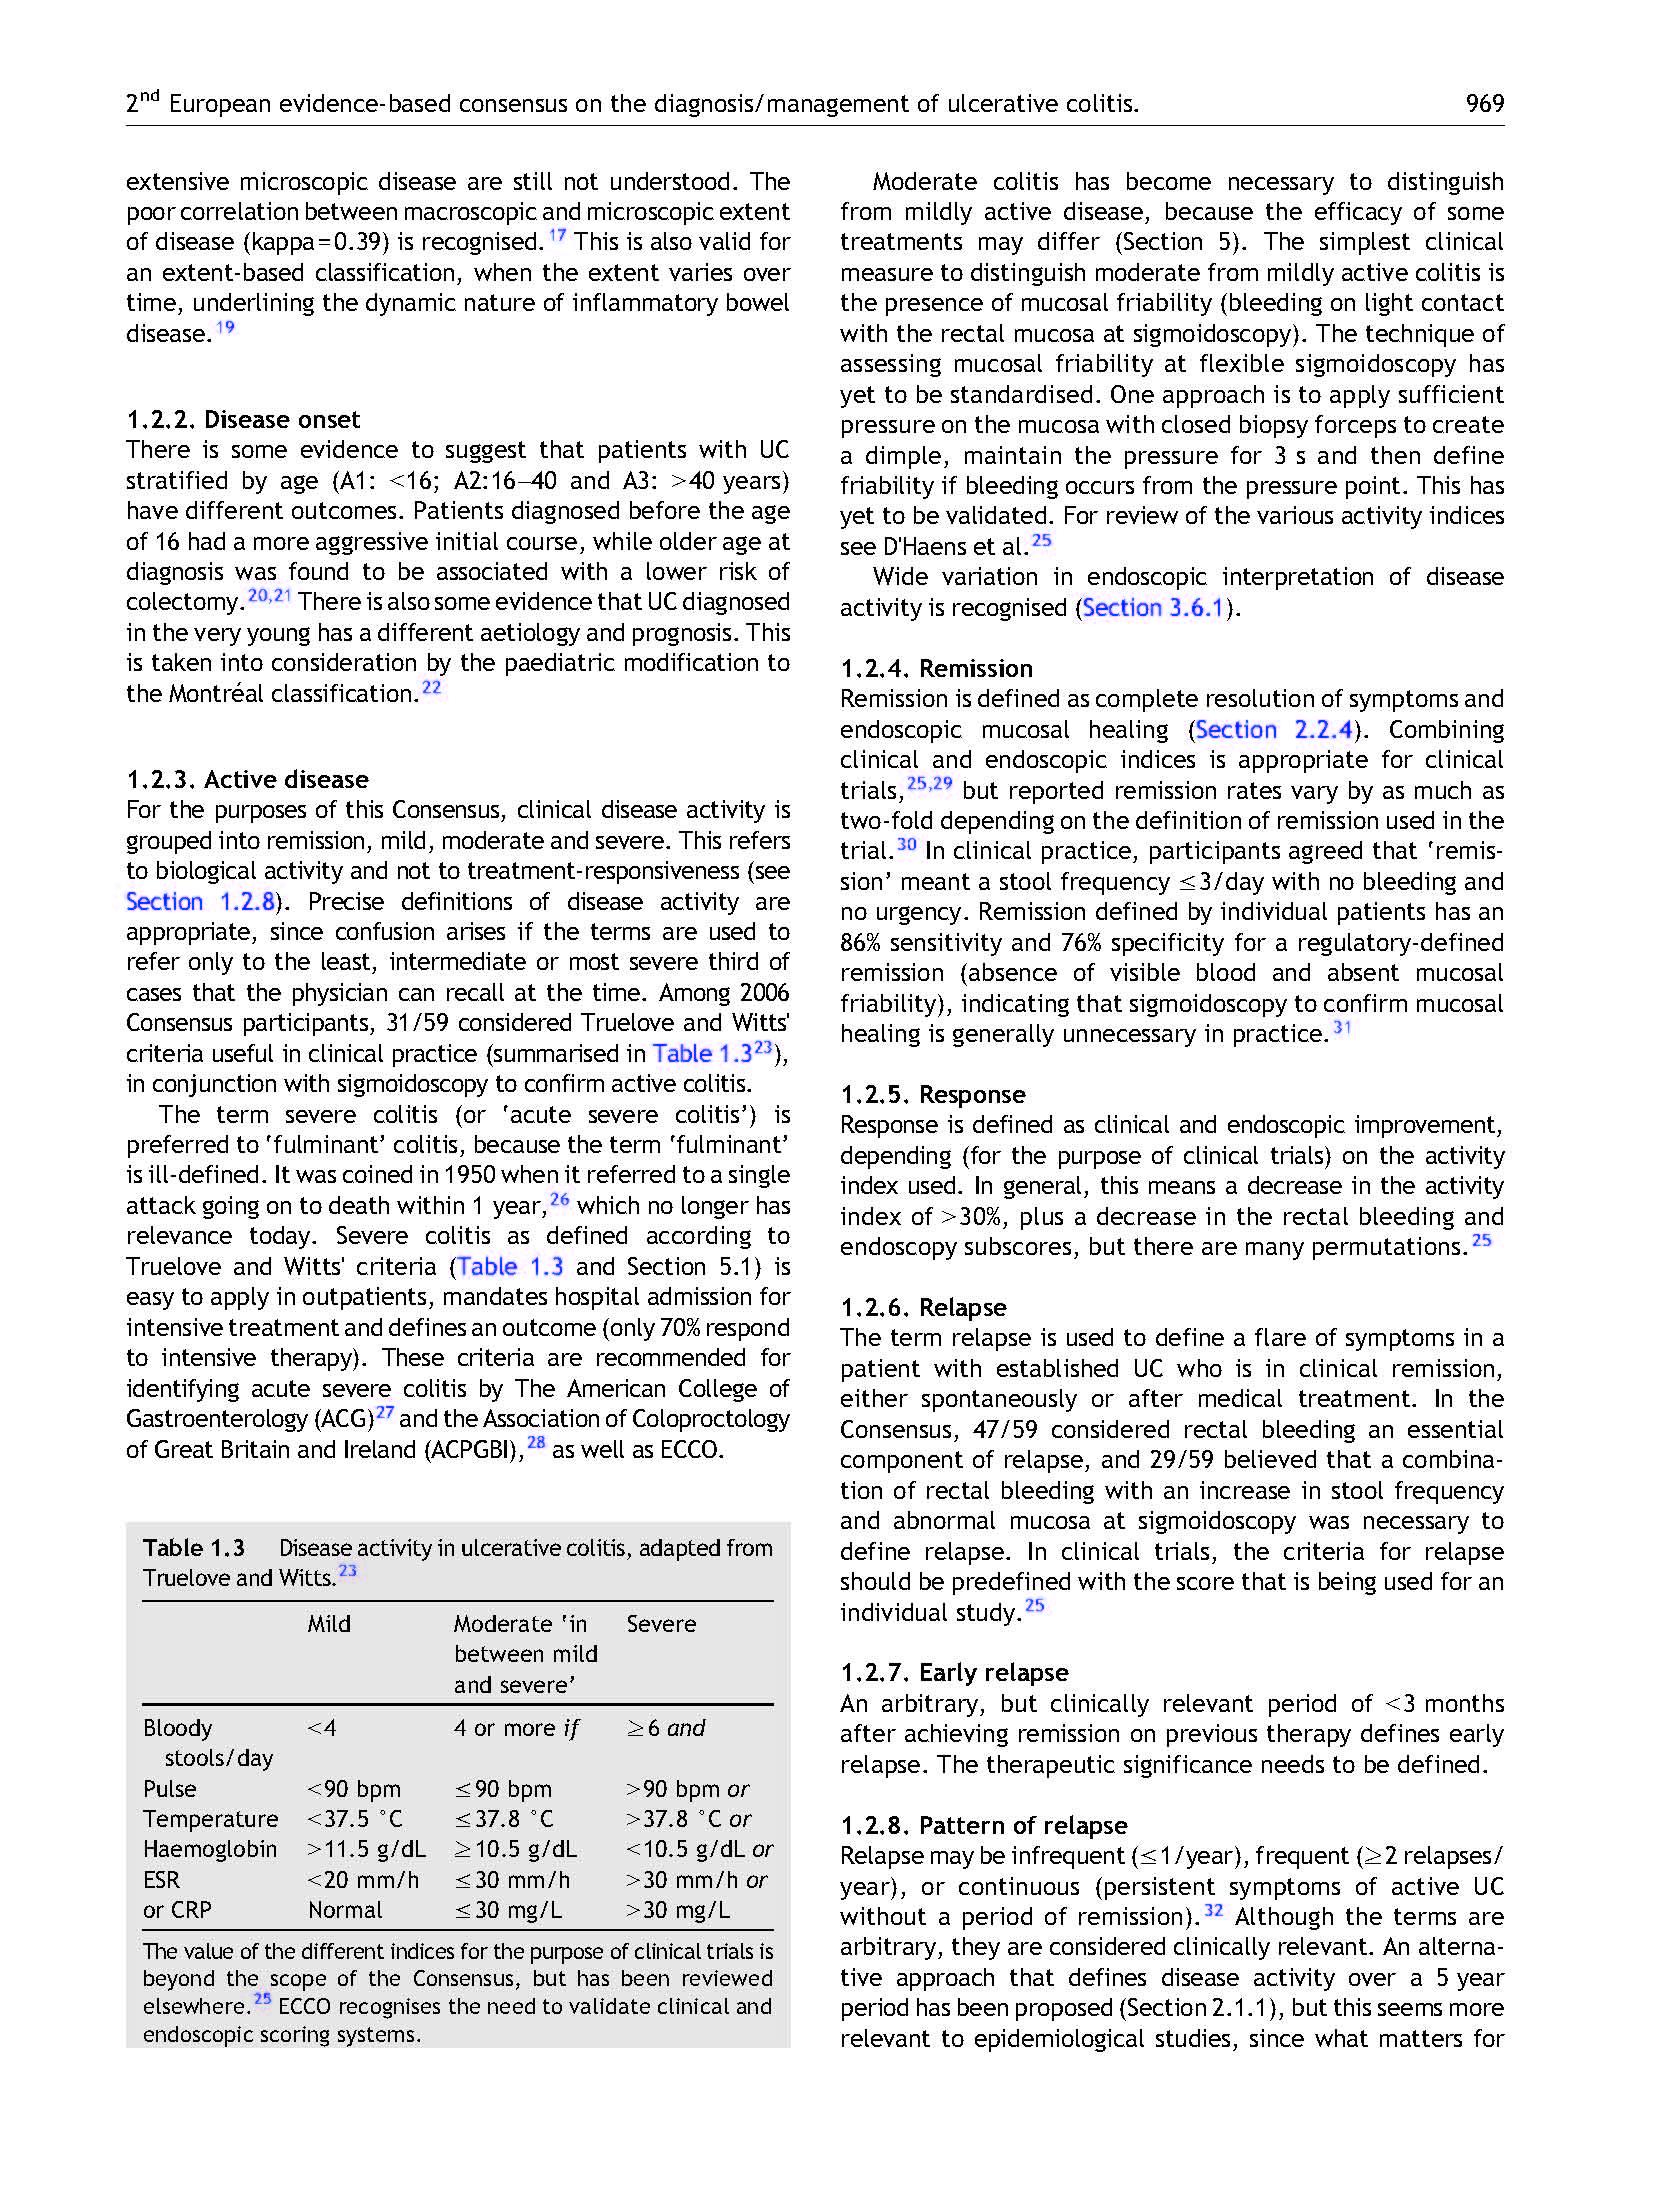 2012-ECCO第二版-欧洲询证共识:溃疡性结肠炎的诊断和处理—定义与诊断_页面_05.jpg